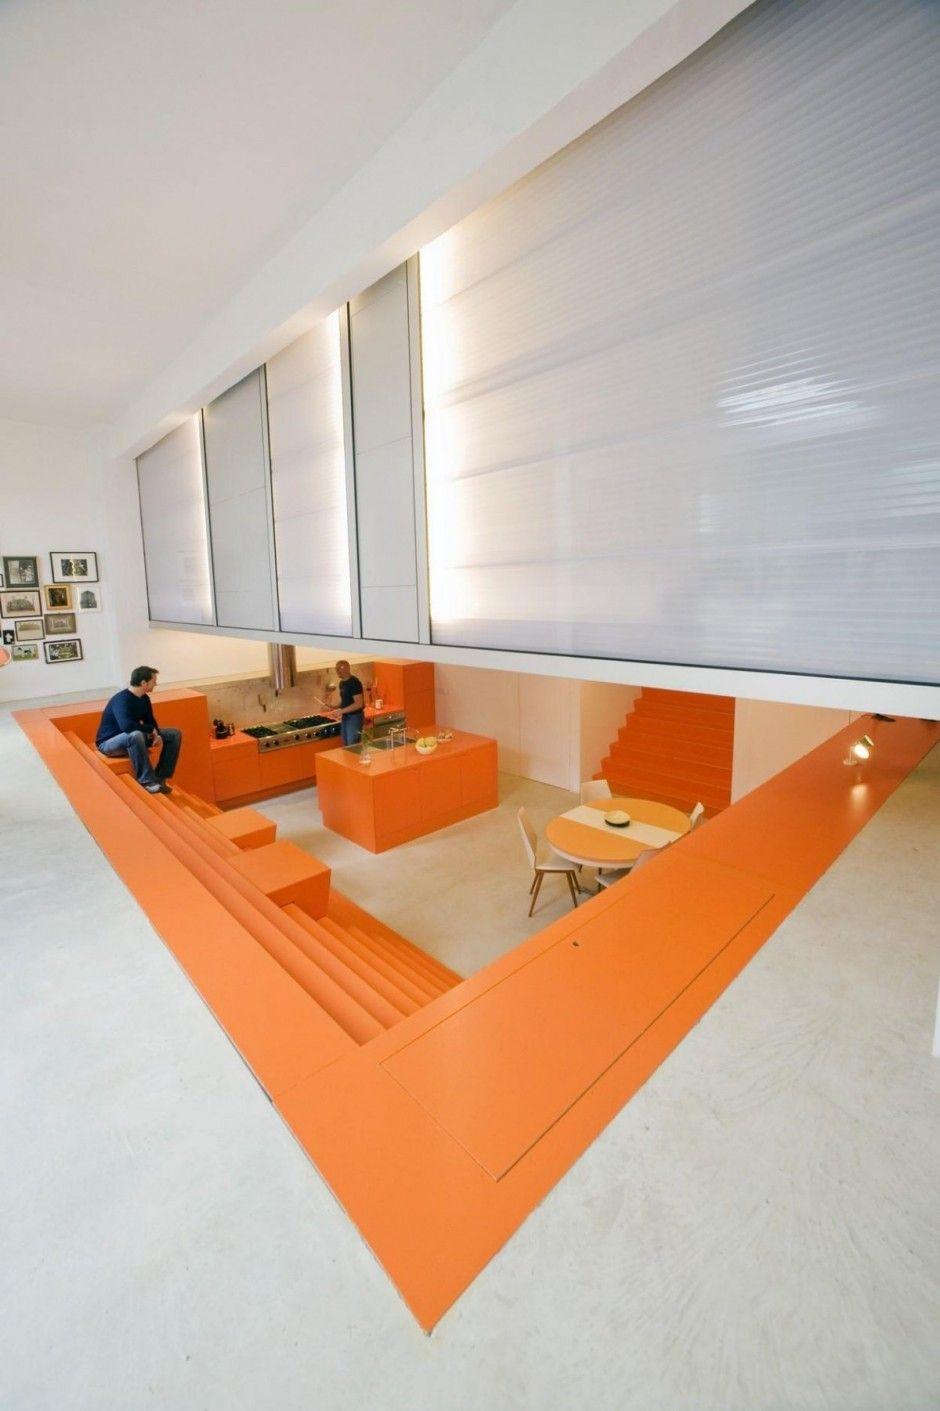 Garage Conversion Interior Architecture Design Interior Architecture Modern House Design